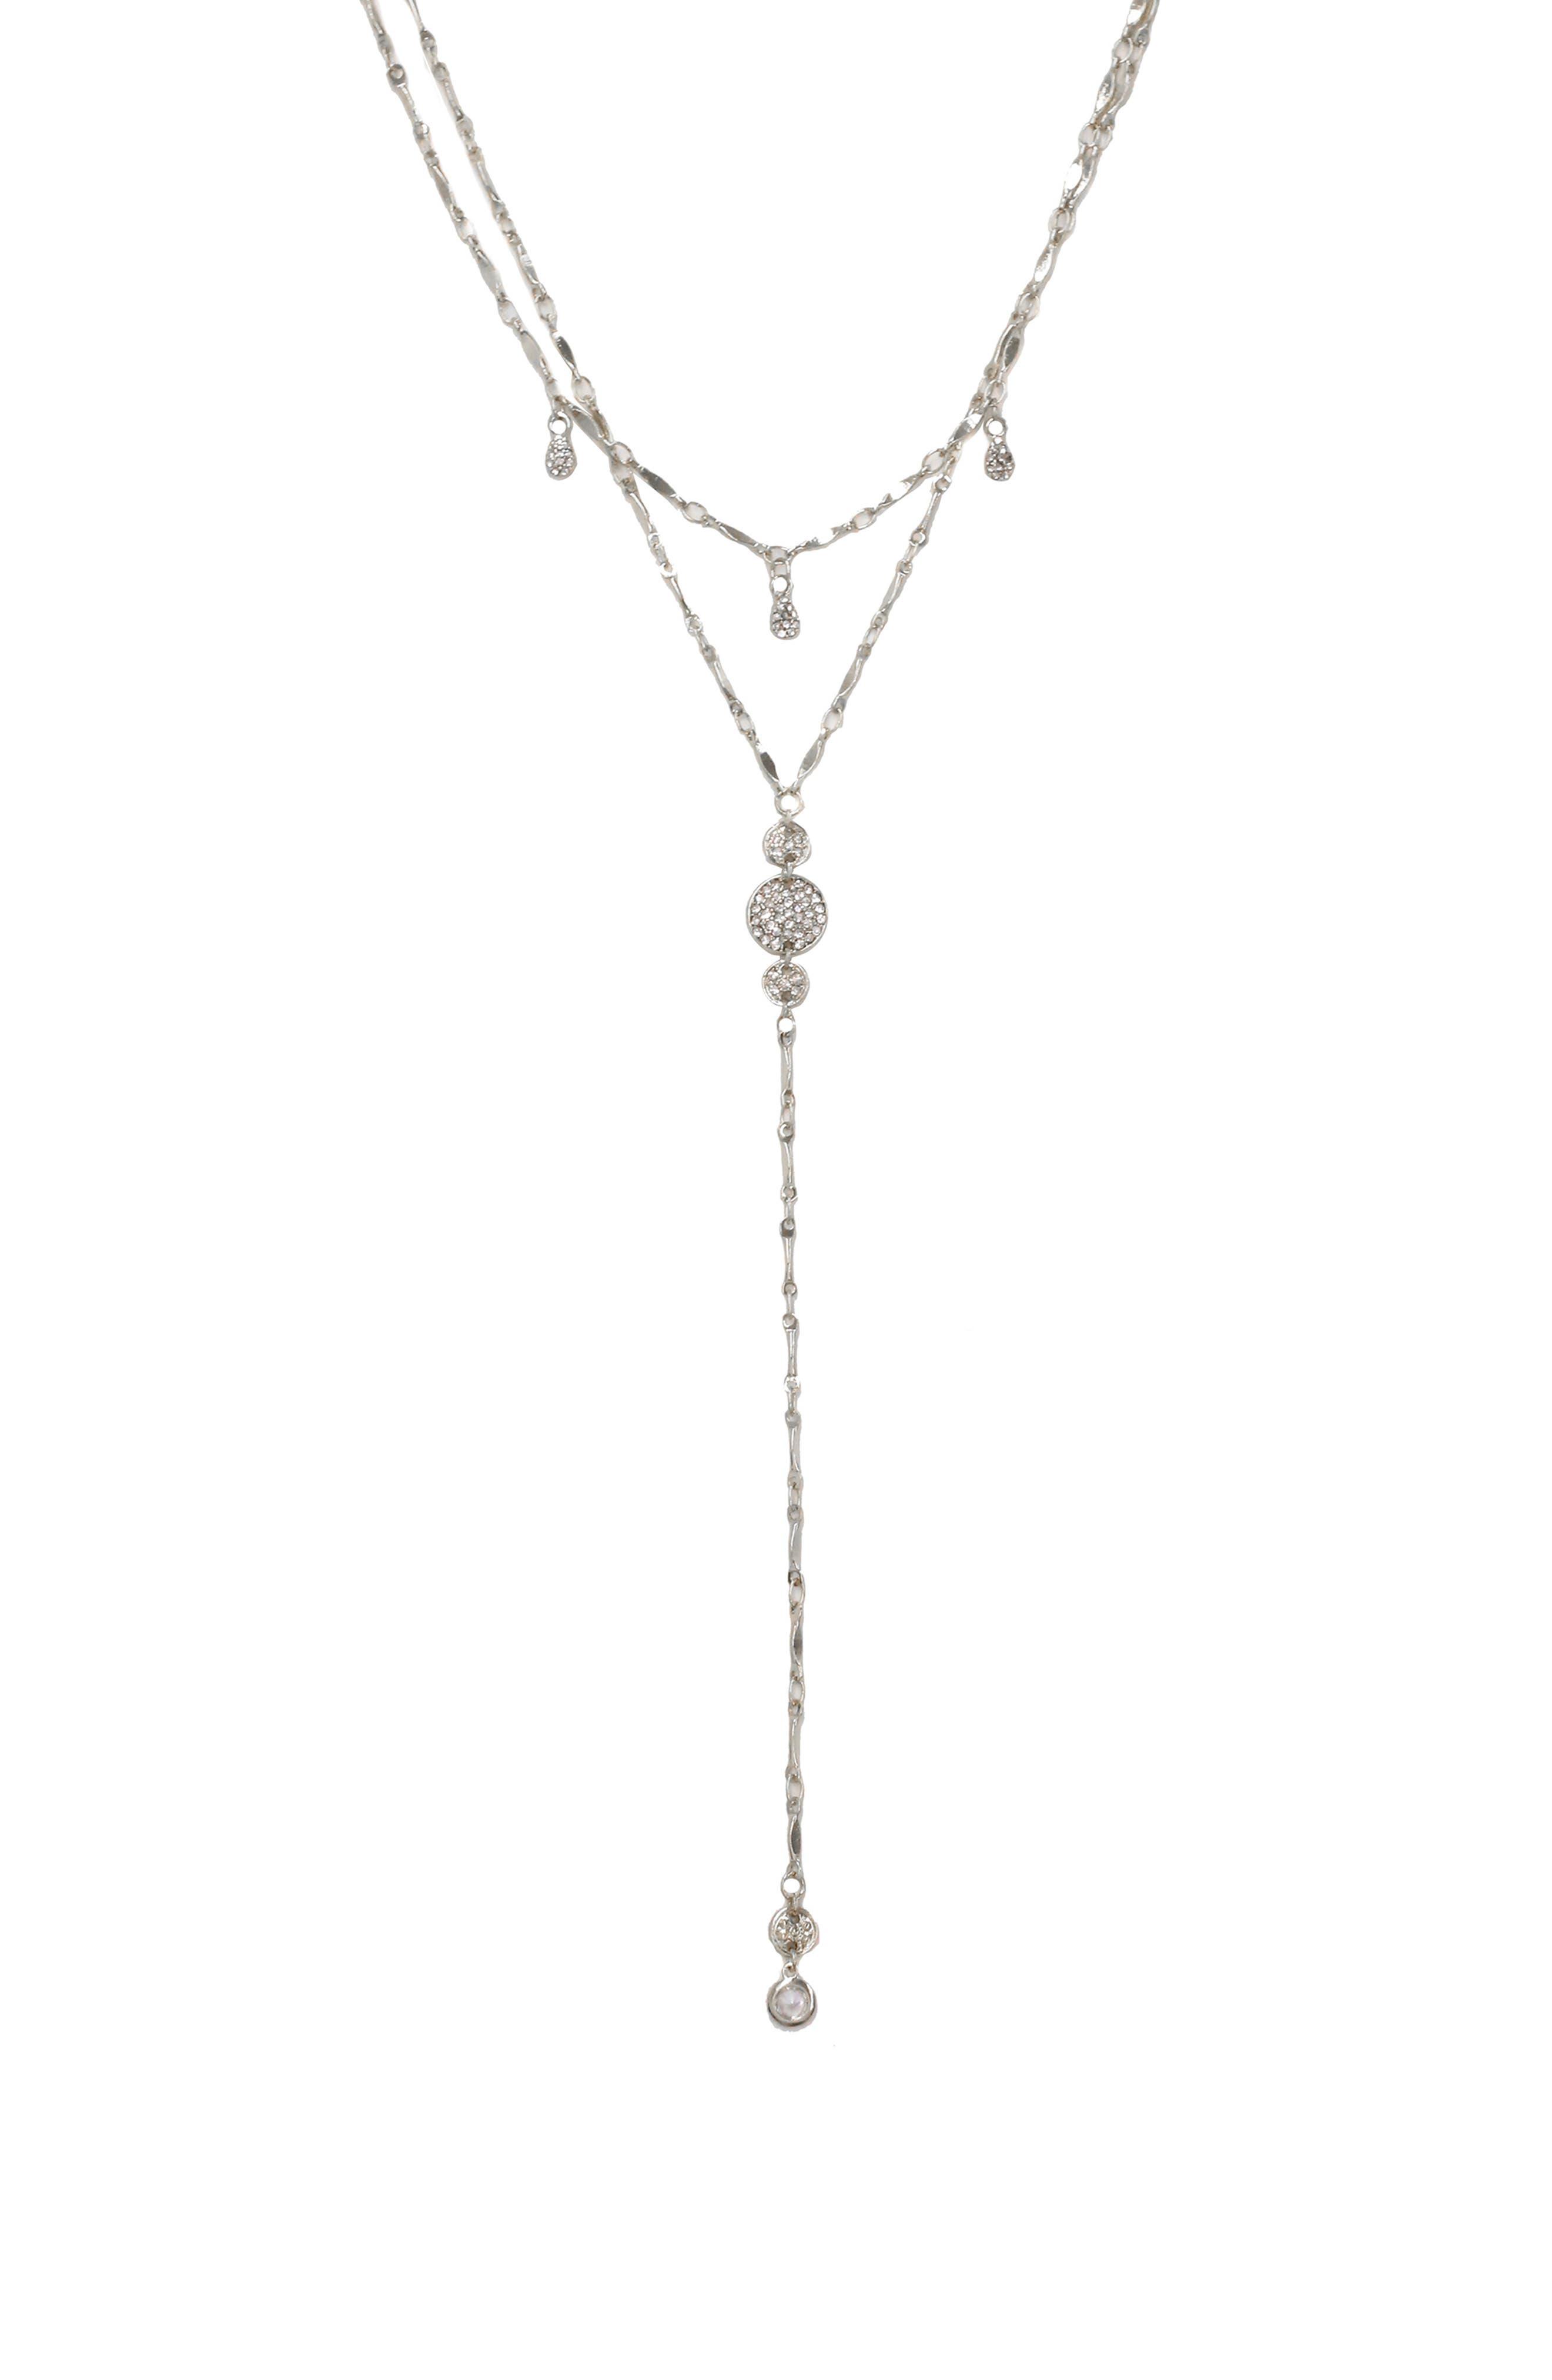 Layered Cubic Zirconia Lariat Necklace